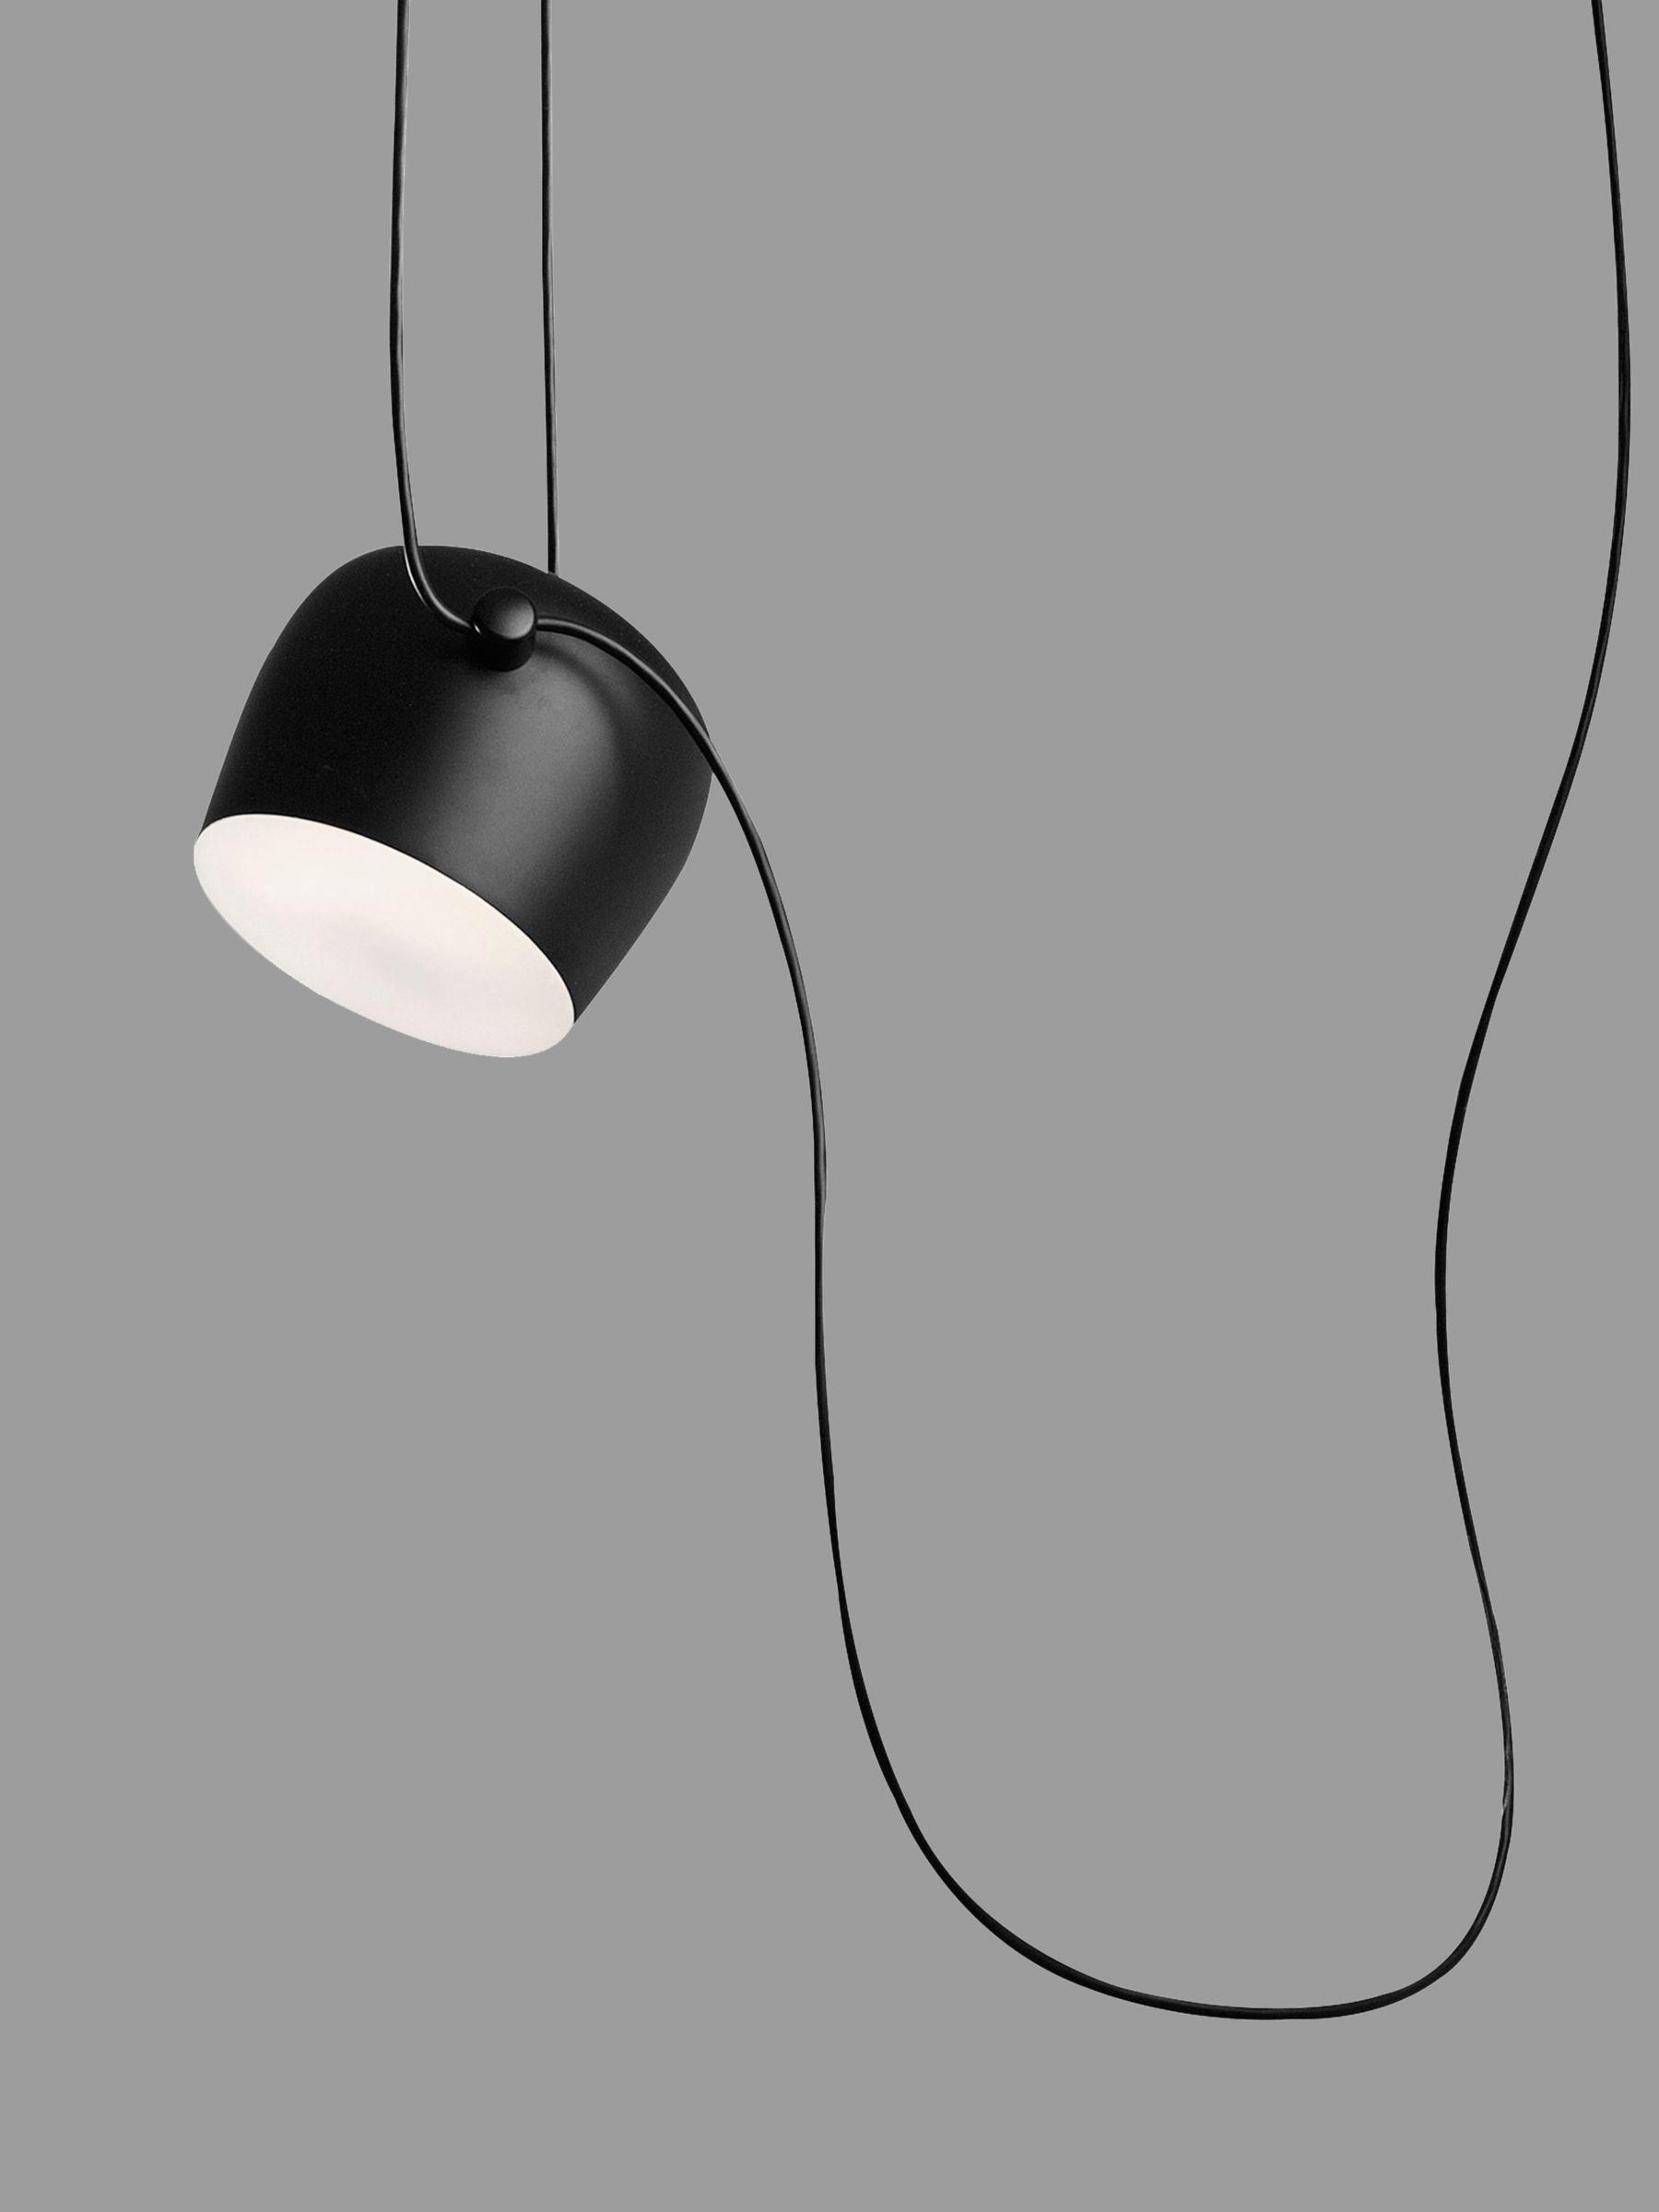 Flos Flos Aim Suspension LED Ceiling Light, Black